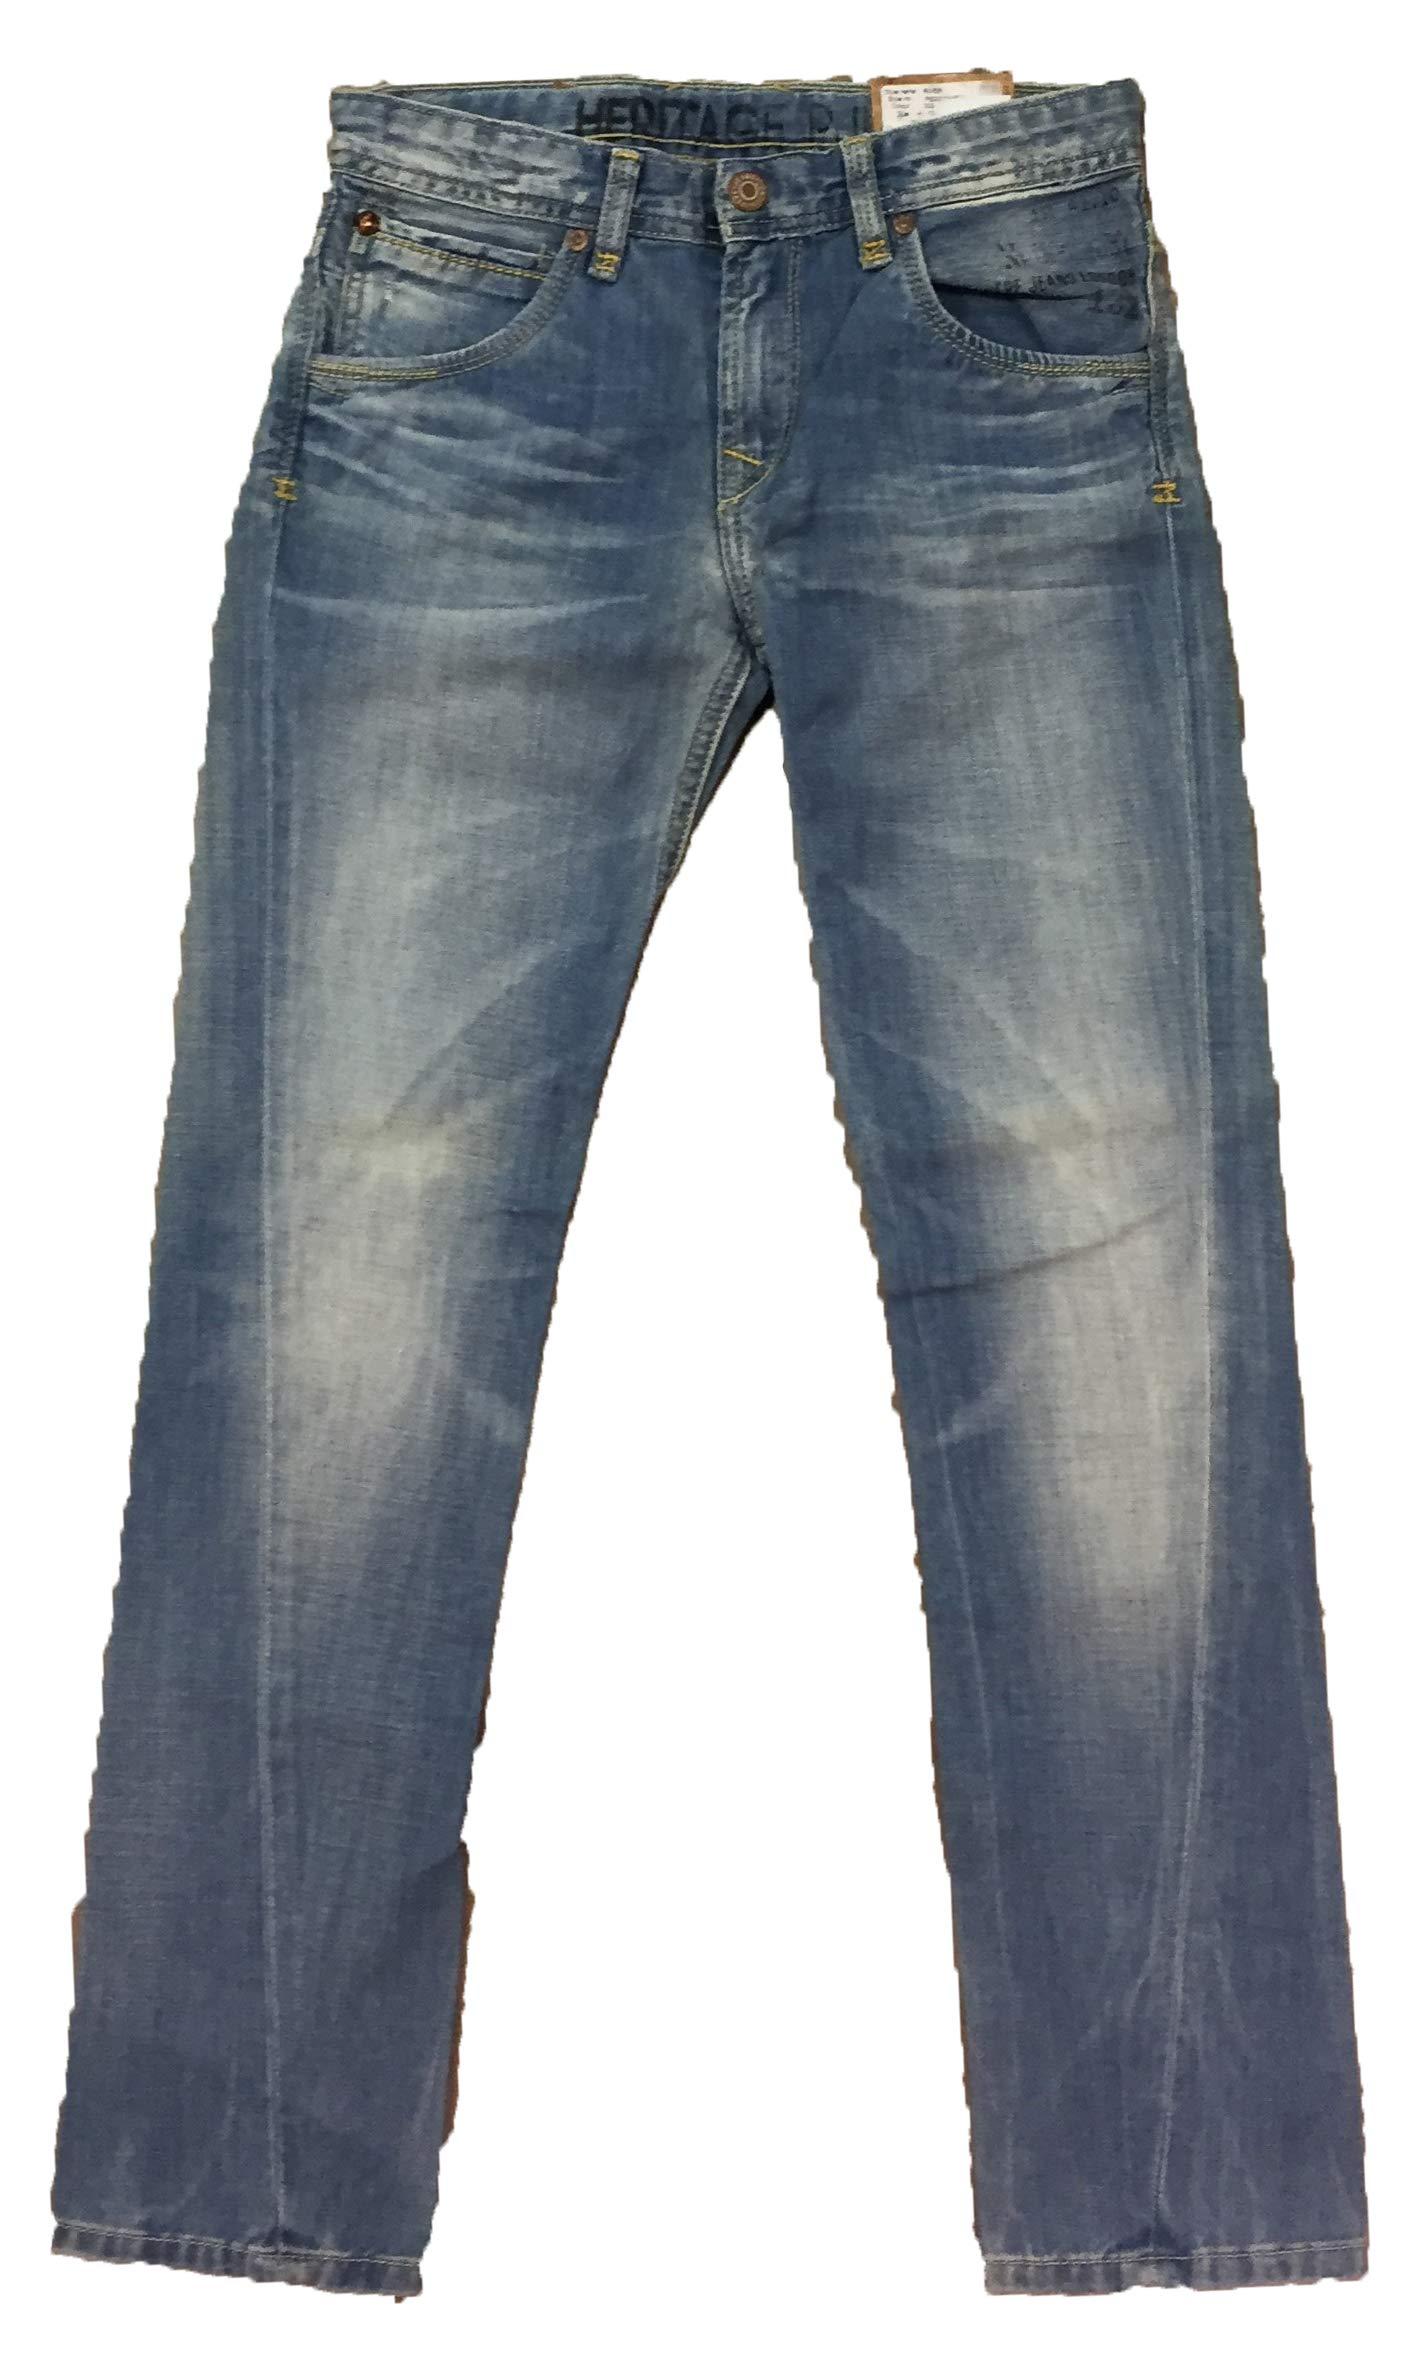 Pepe Jeans – Pantalón Largo River, Chico, Color: Indigo